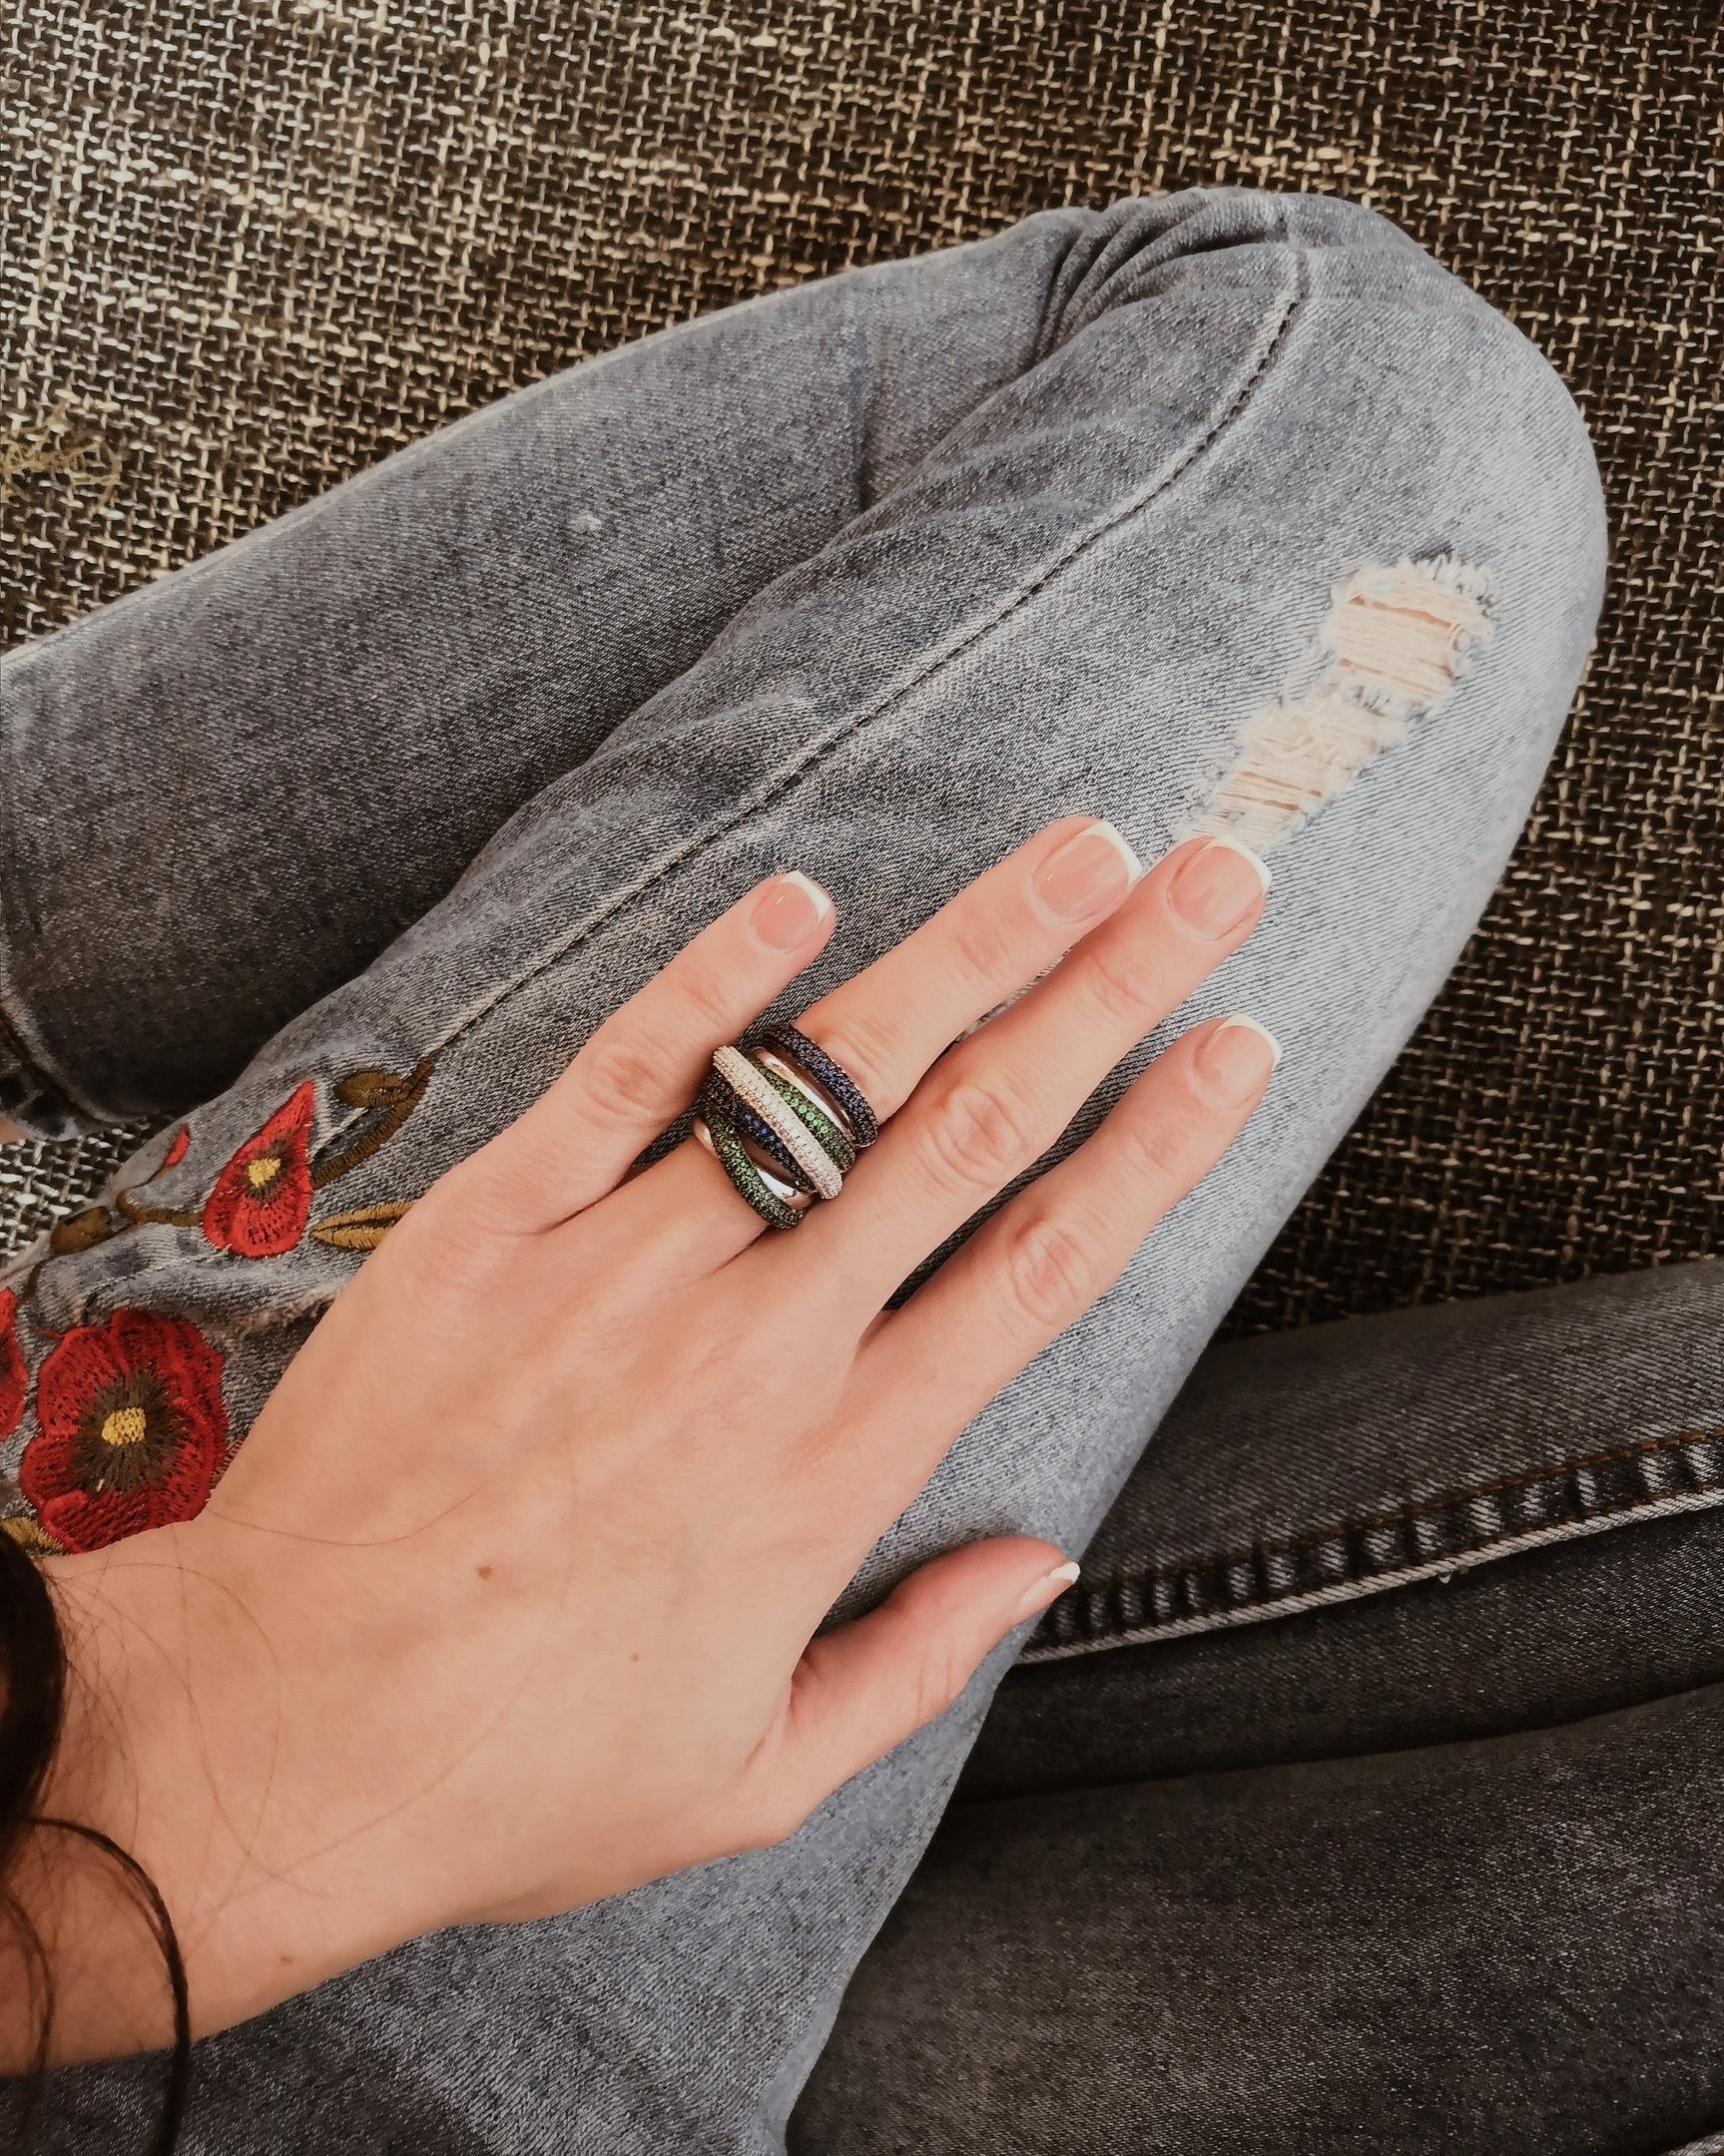 GODKI Monaco Design Luxury Statement Stackable Ring For Women Wedding Cubic Zircon Engagement Dubai Punk Bridal Top Finger Rings 5